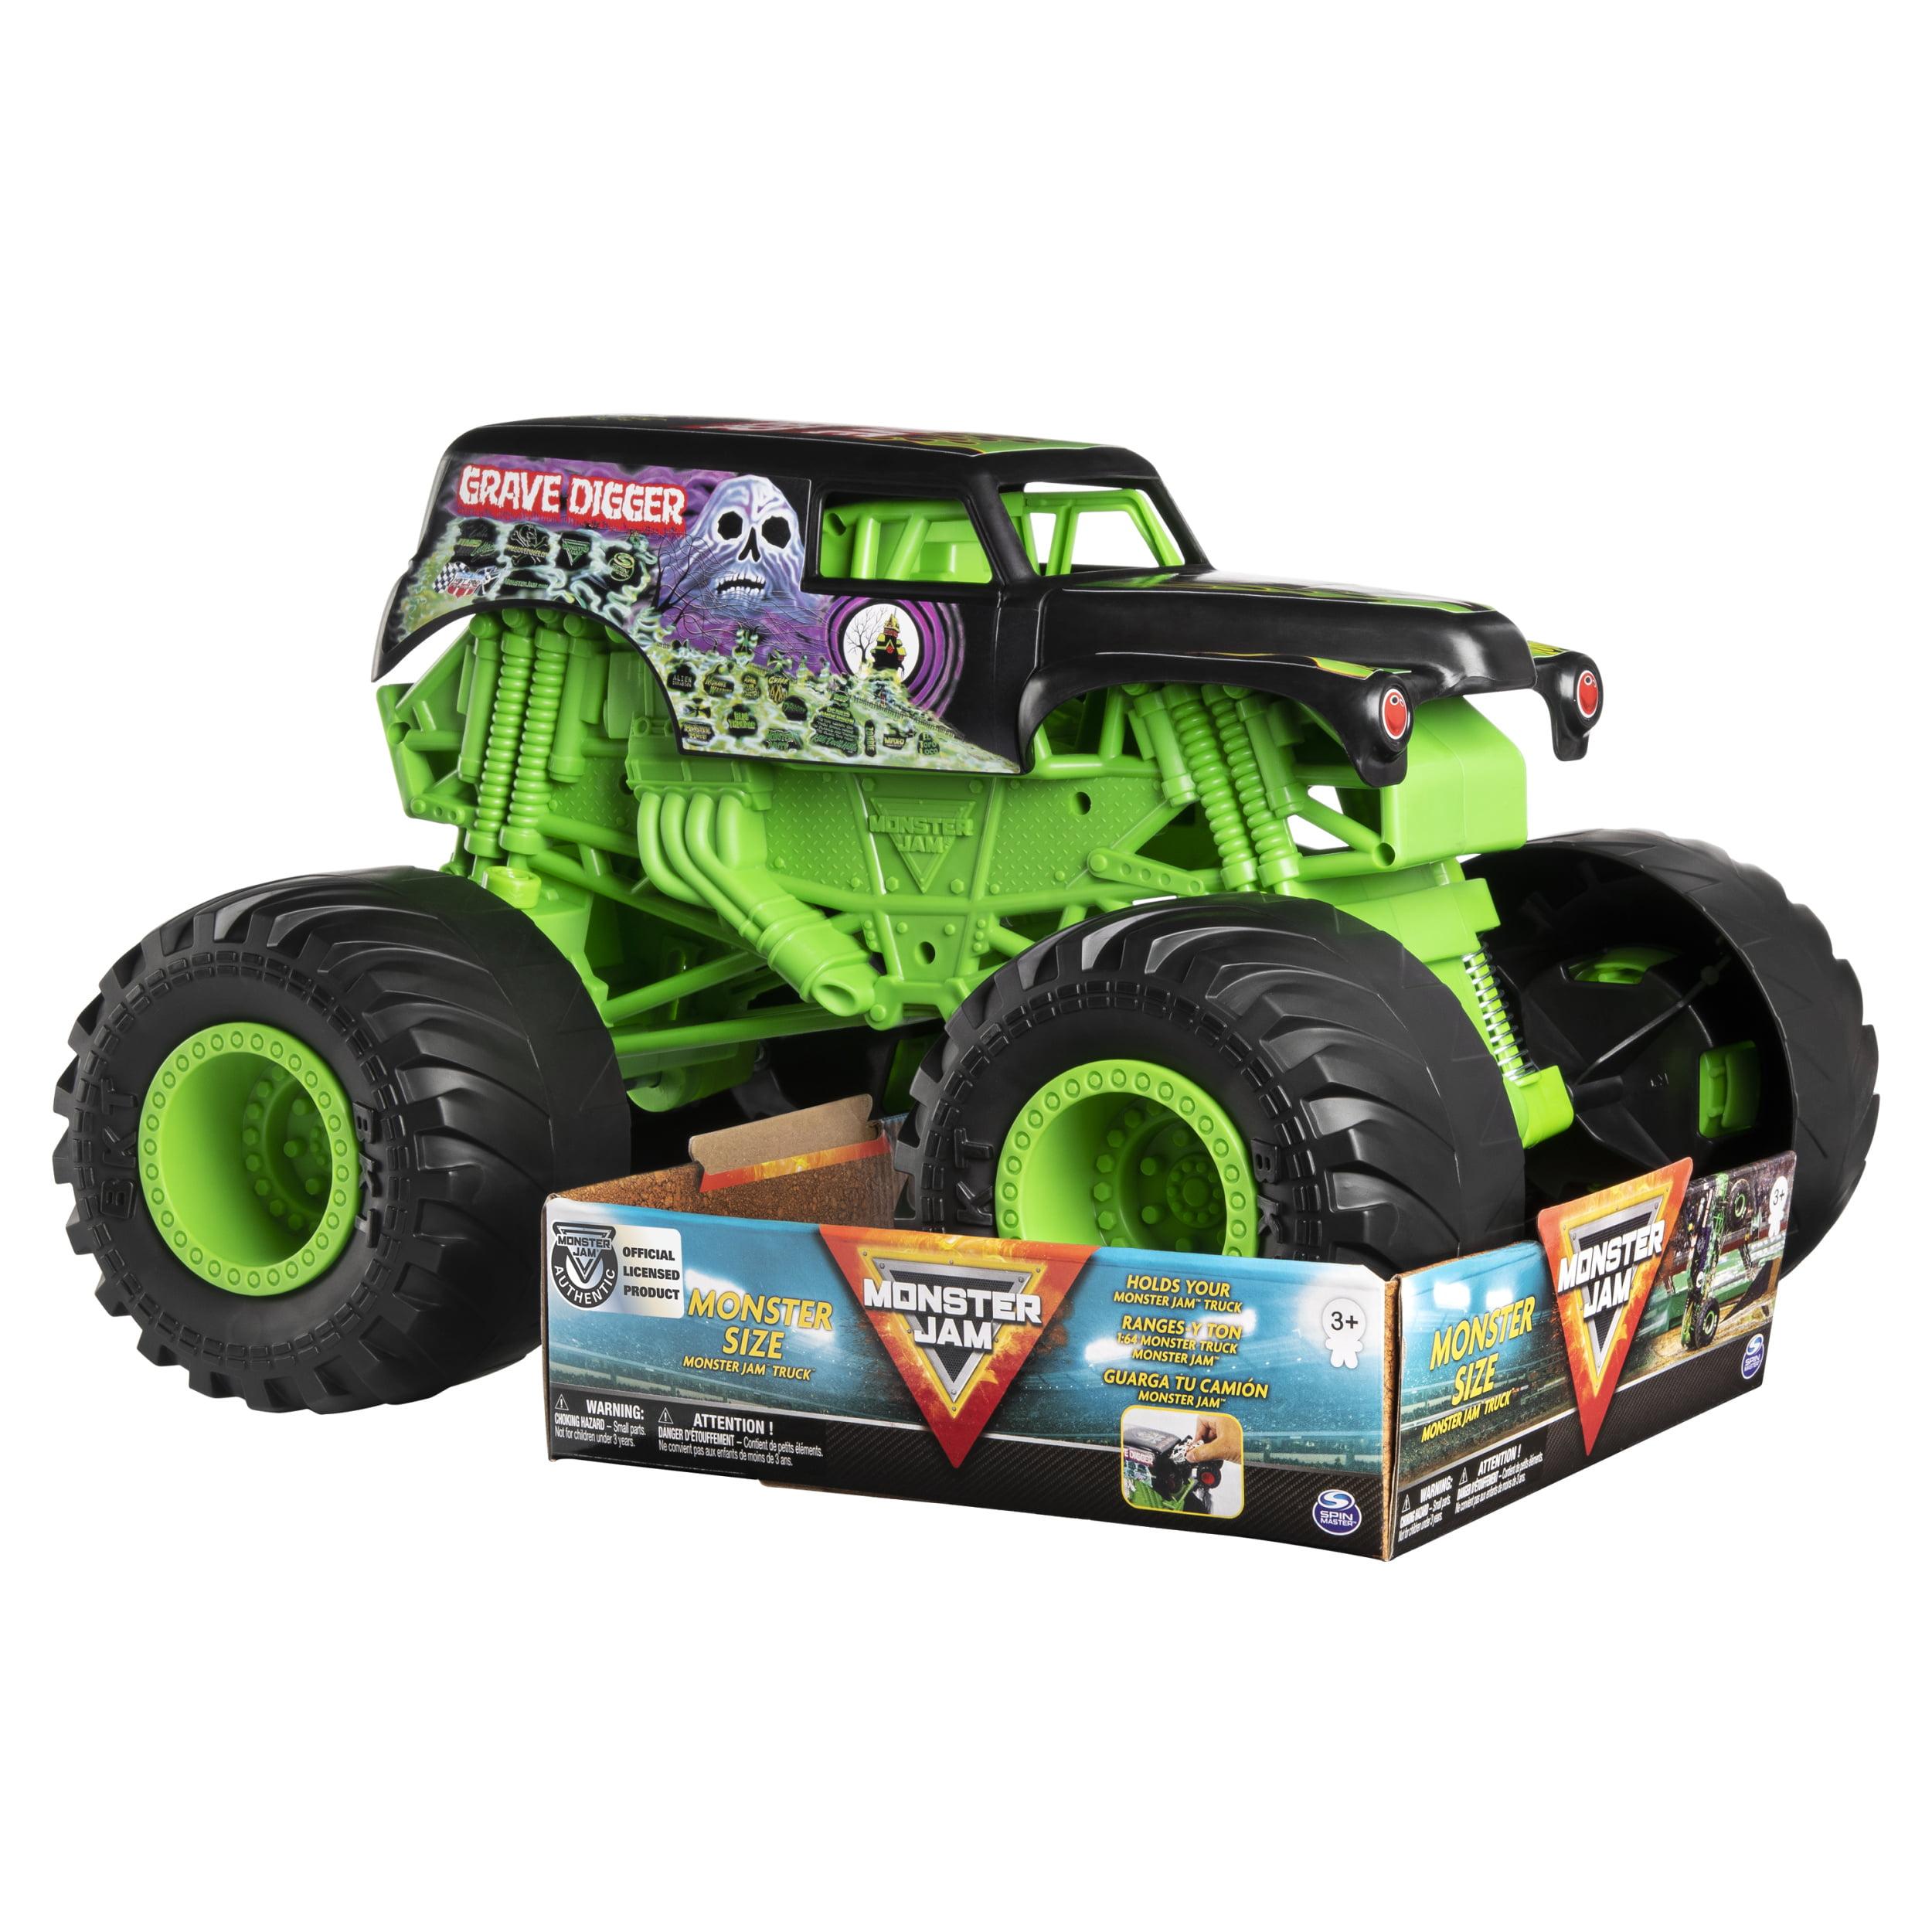 Monster Jam Monster Size Grave Digger Monster Jam Truck 1 10 Scale Walmart Com Walmart Com